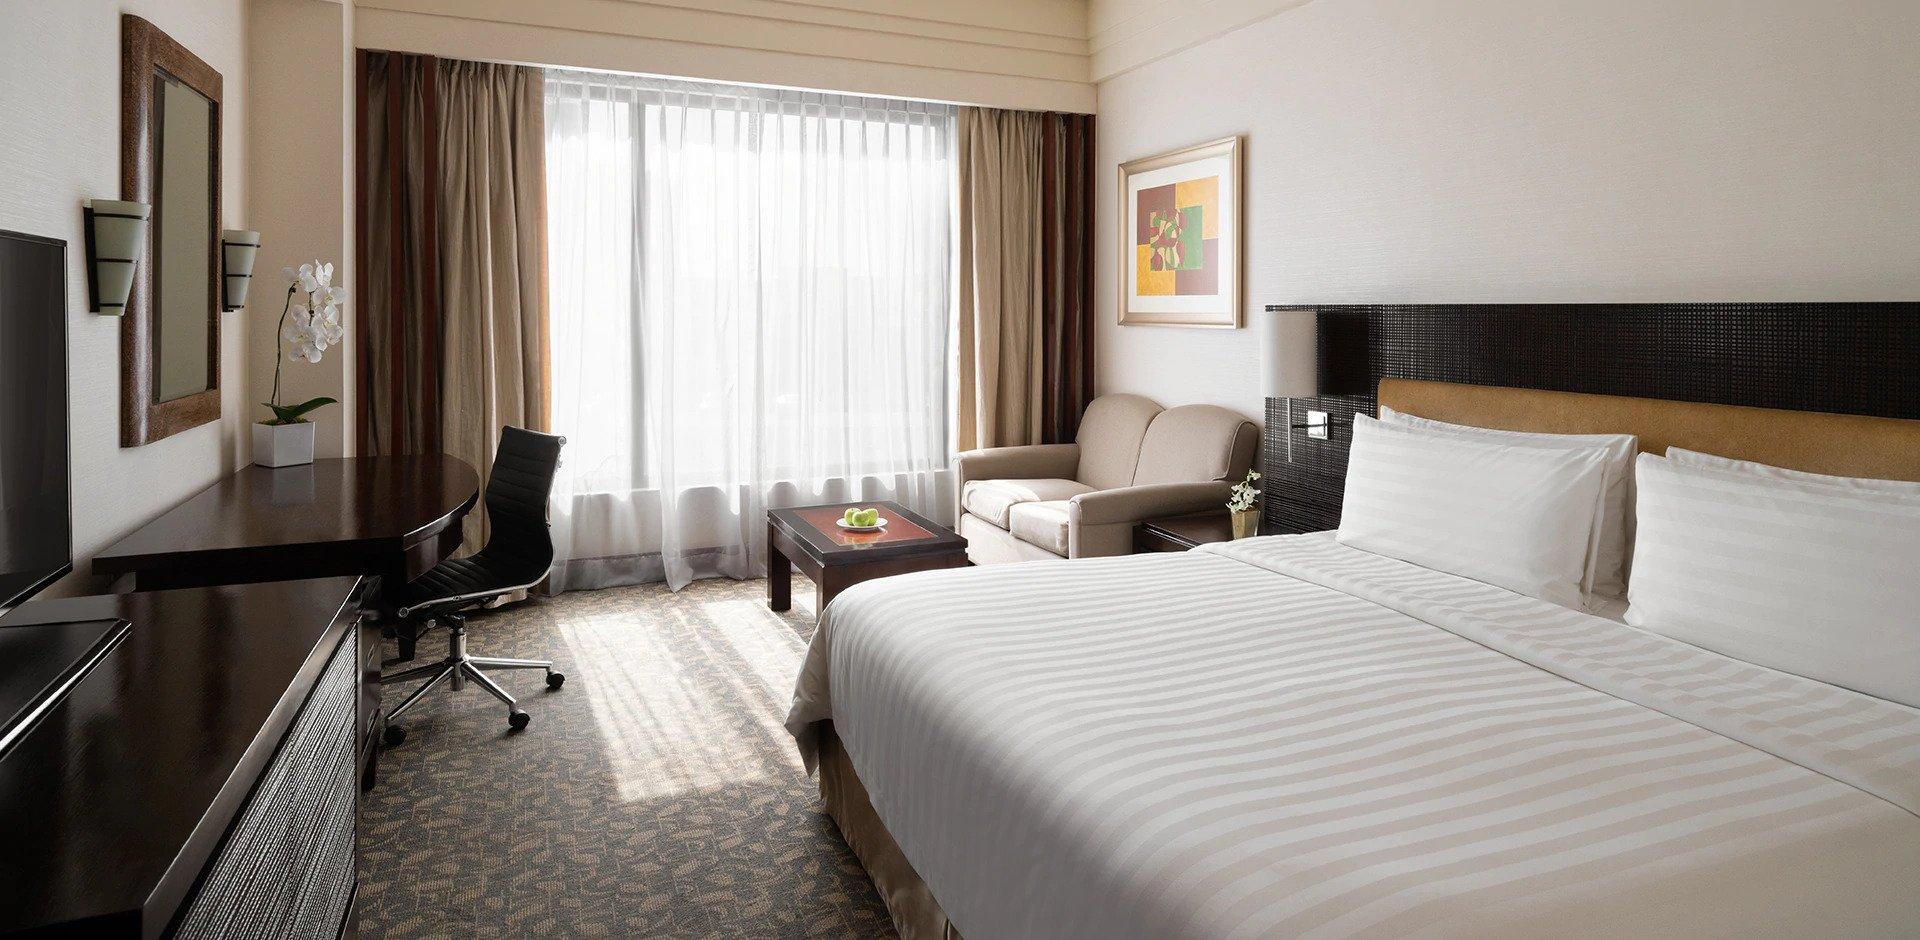 Enjoy your room during your last few days in EDSA Shangri-la Hotel